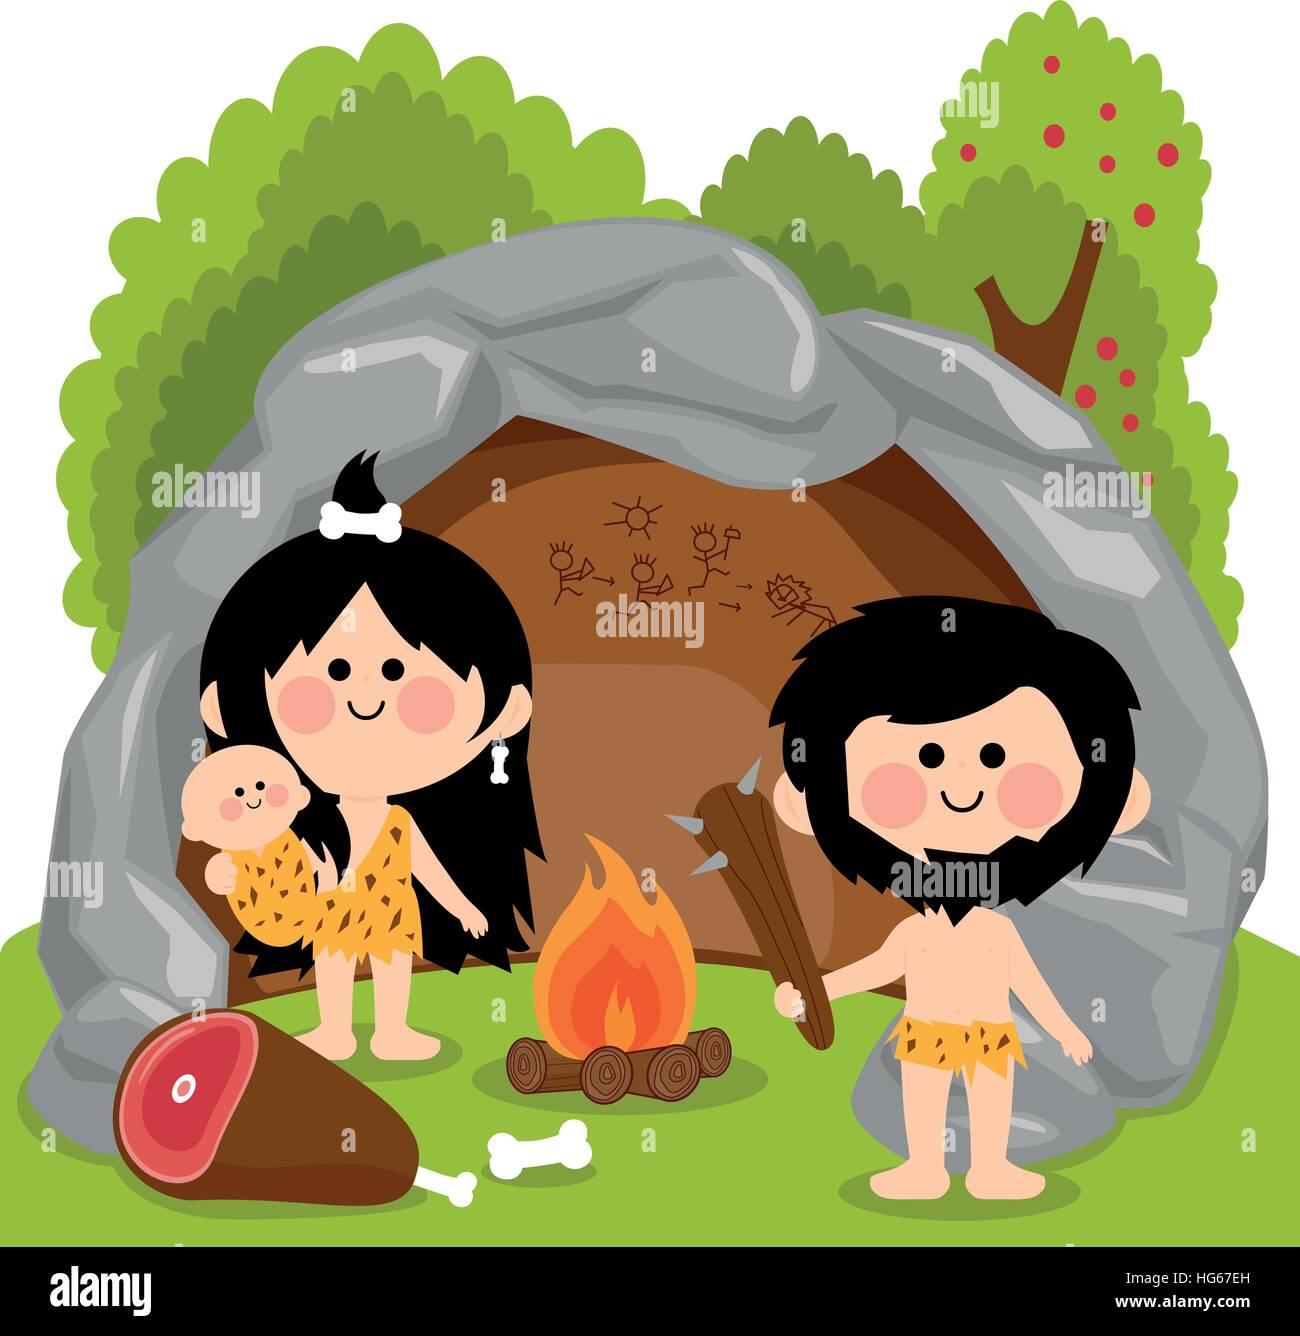 Cavemen family in stone cave. - Stock Image